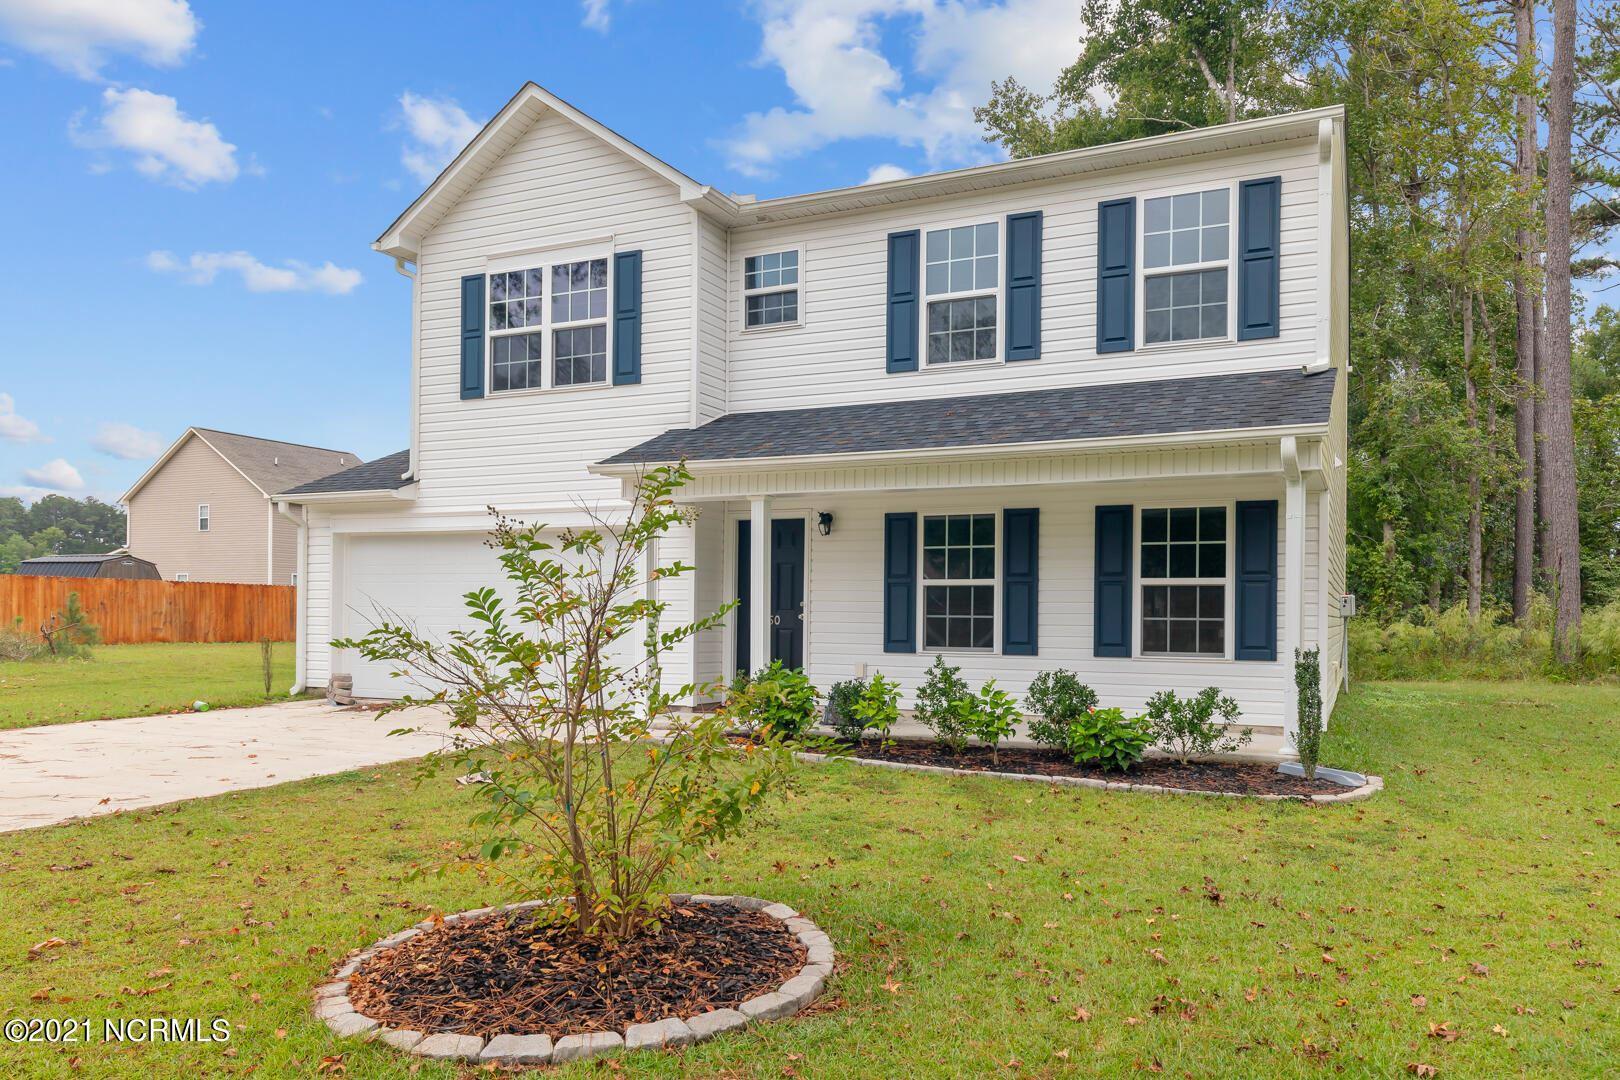 Photo of 250 Sewell Road, Jacksonville, NC 28540 (MLS # 100296202)